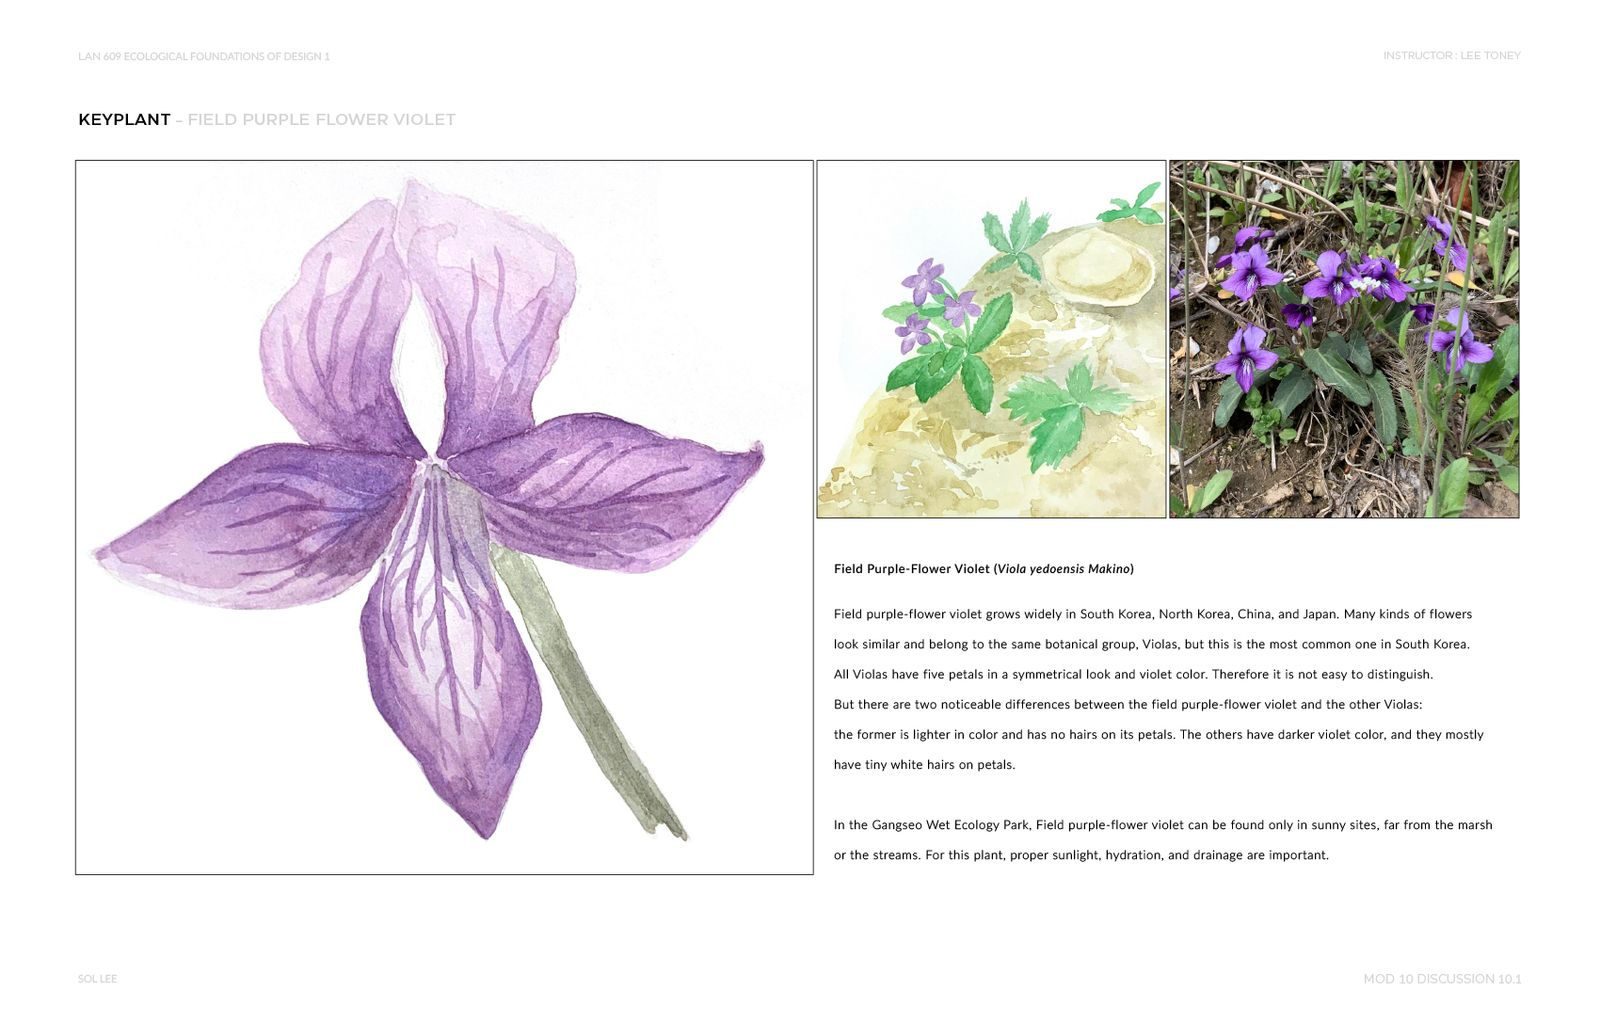 Gangseo Wet Ecology Park - Key Plant - Field Purple Flower Violet